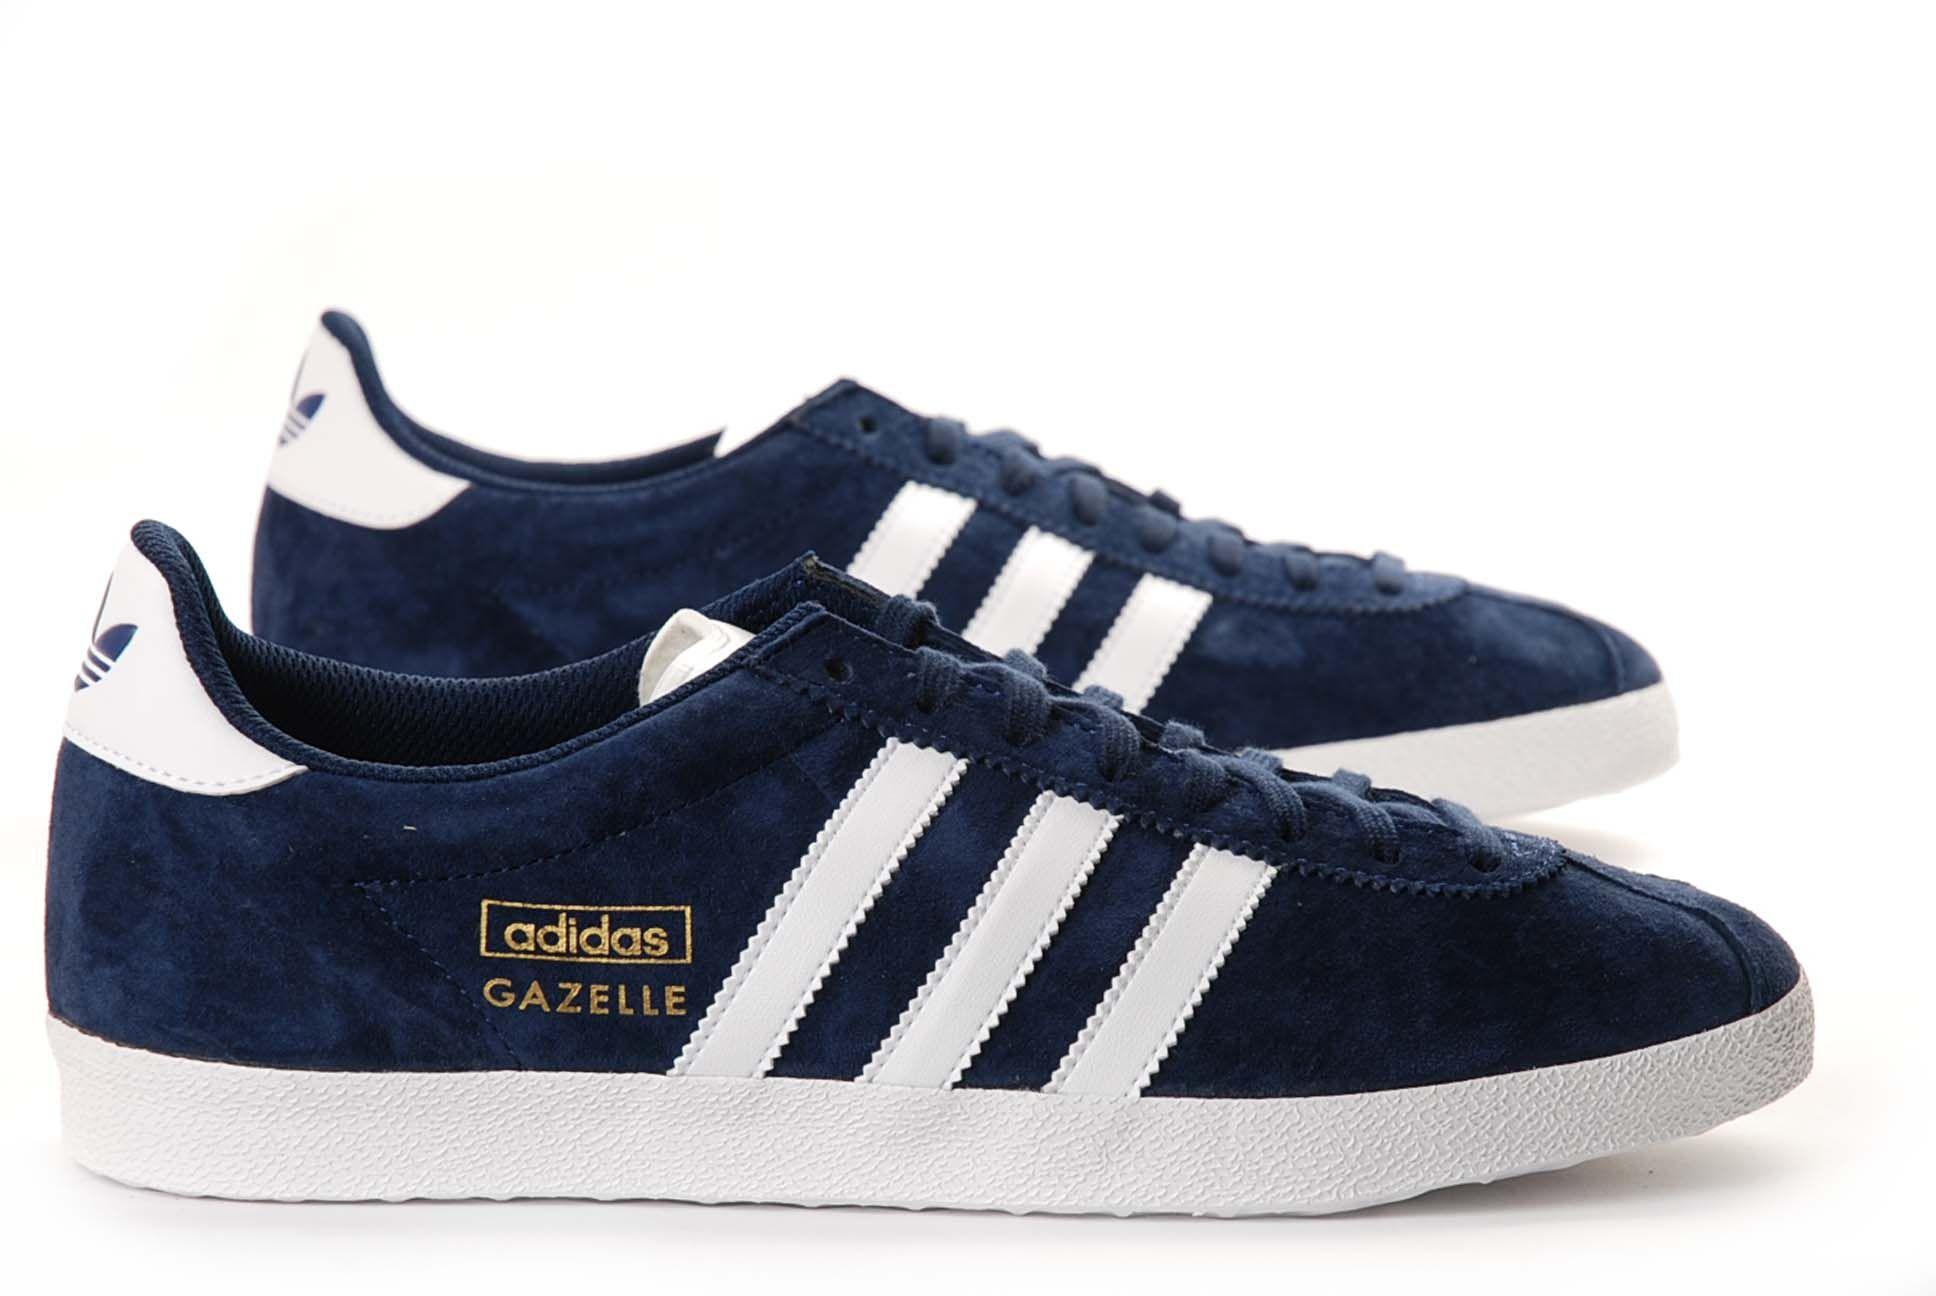 Adidas Gazelle OG Bleu Marine | Mode